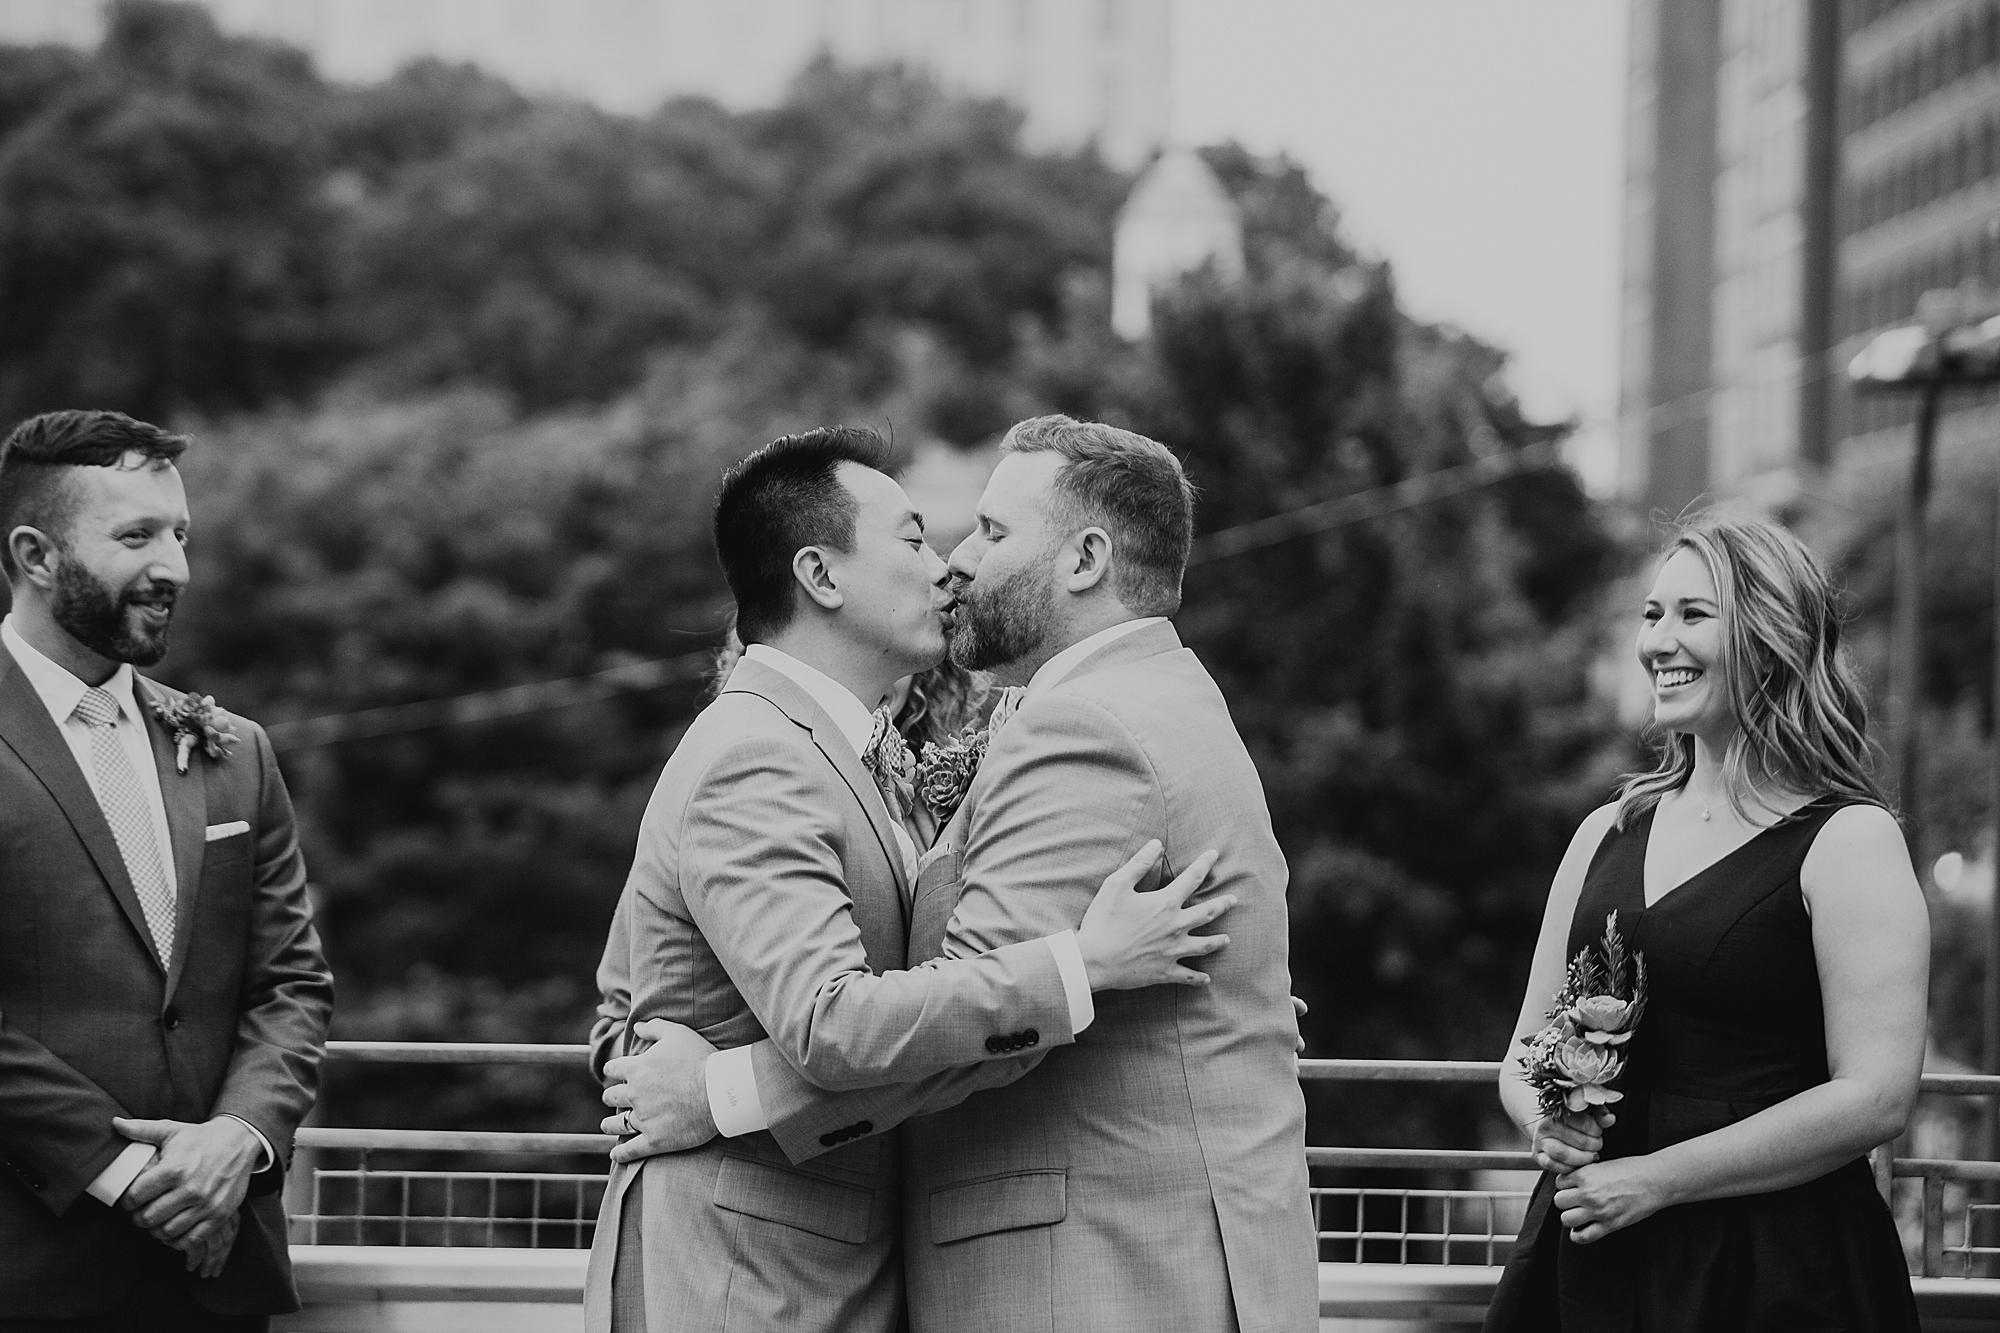 Dan_and_Byron_Love_by_Joe_Mac_Philadelphia_Wedding_LGBTQ_Photography_Gay_Independence_visitor_Center_102.JPG